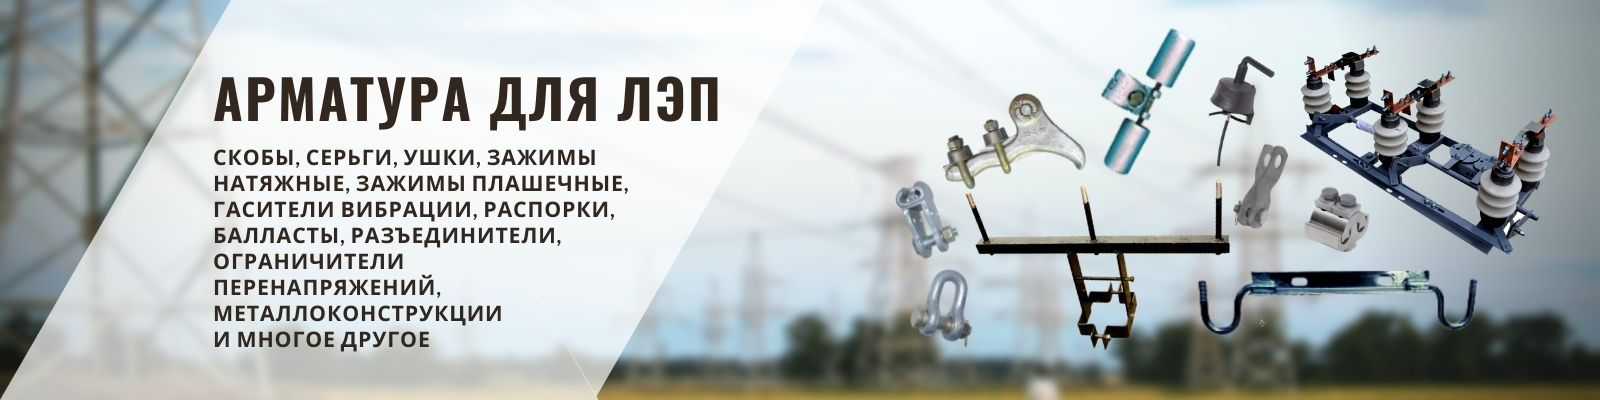 Арматура для линий электропередач ВЛ